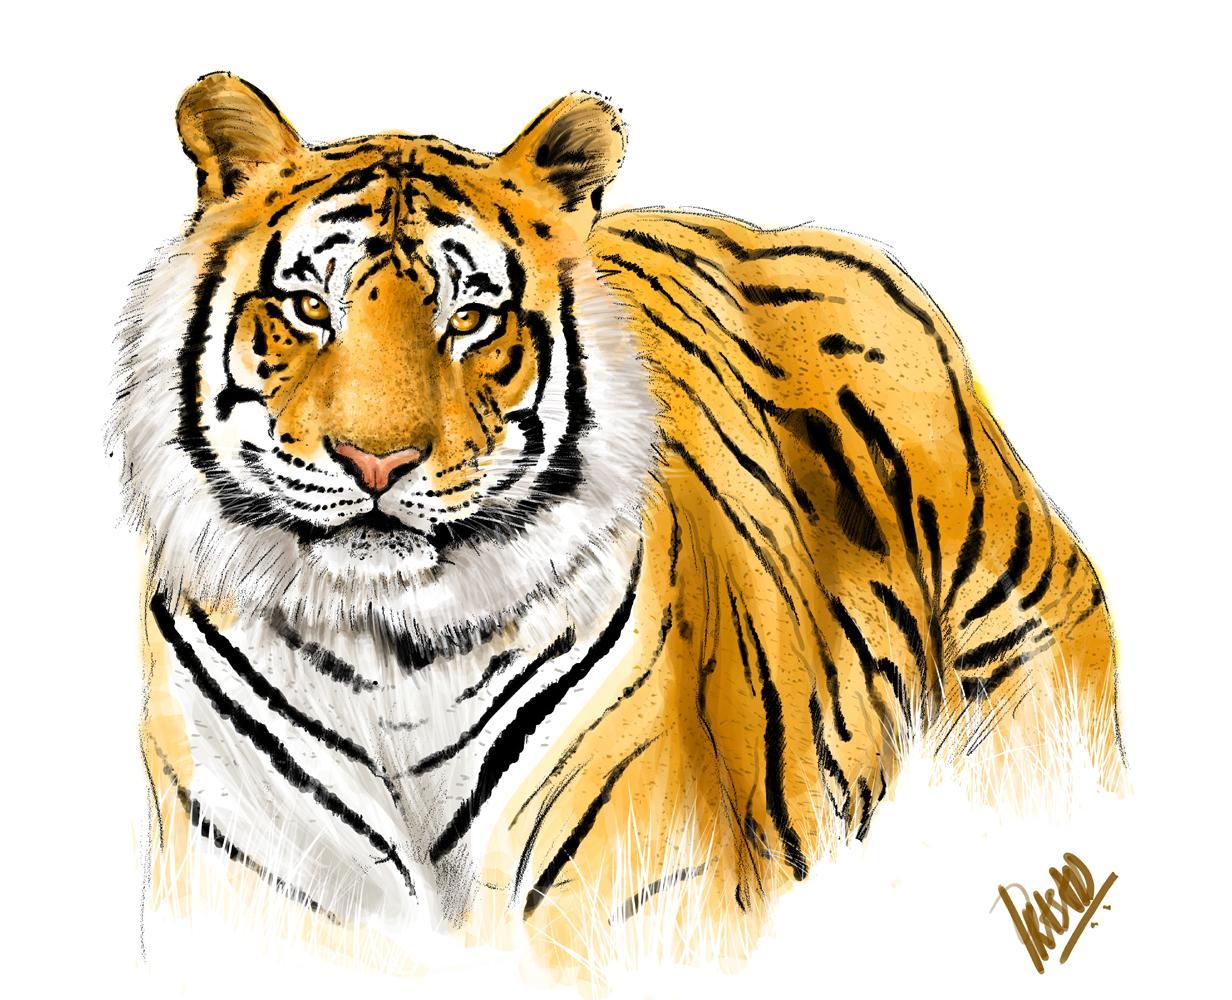 1232x1000 Tiger Images The Royal Bengal Tiger